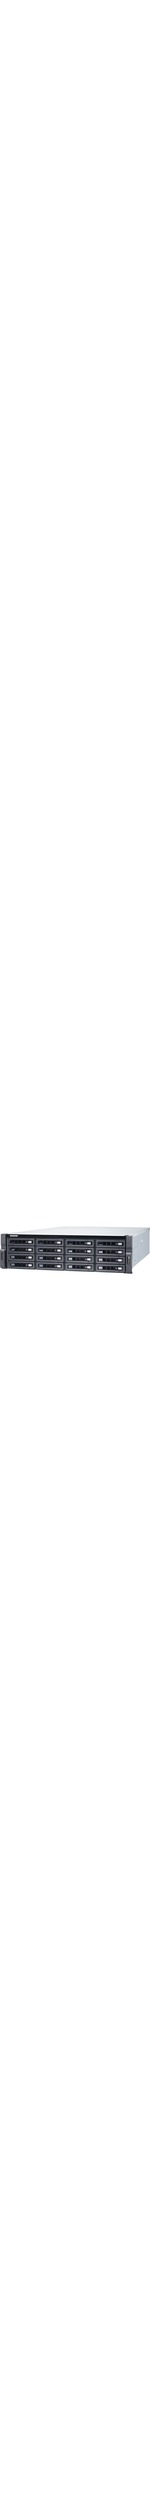 QNAP TS-1683XU-RP-E2124-16G 16 x Total Bays SAN/NAS Storage System - 4 GB Flash Memory Capacity - Intel Xeon Quad-core 4 Core 3.30 GHz - 16 GB RAM - DDR4 SDRAM - 3